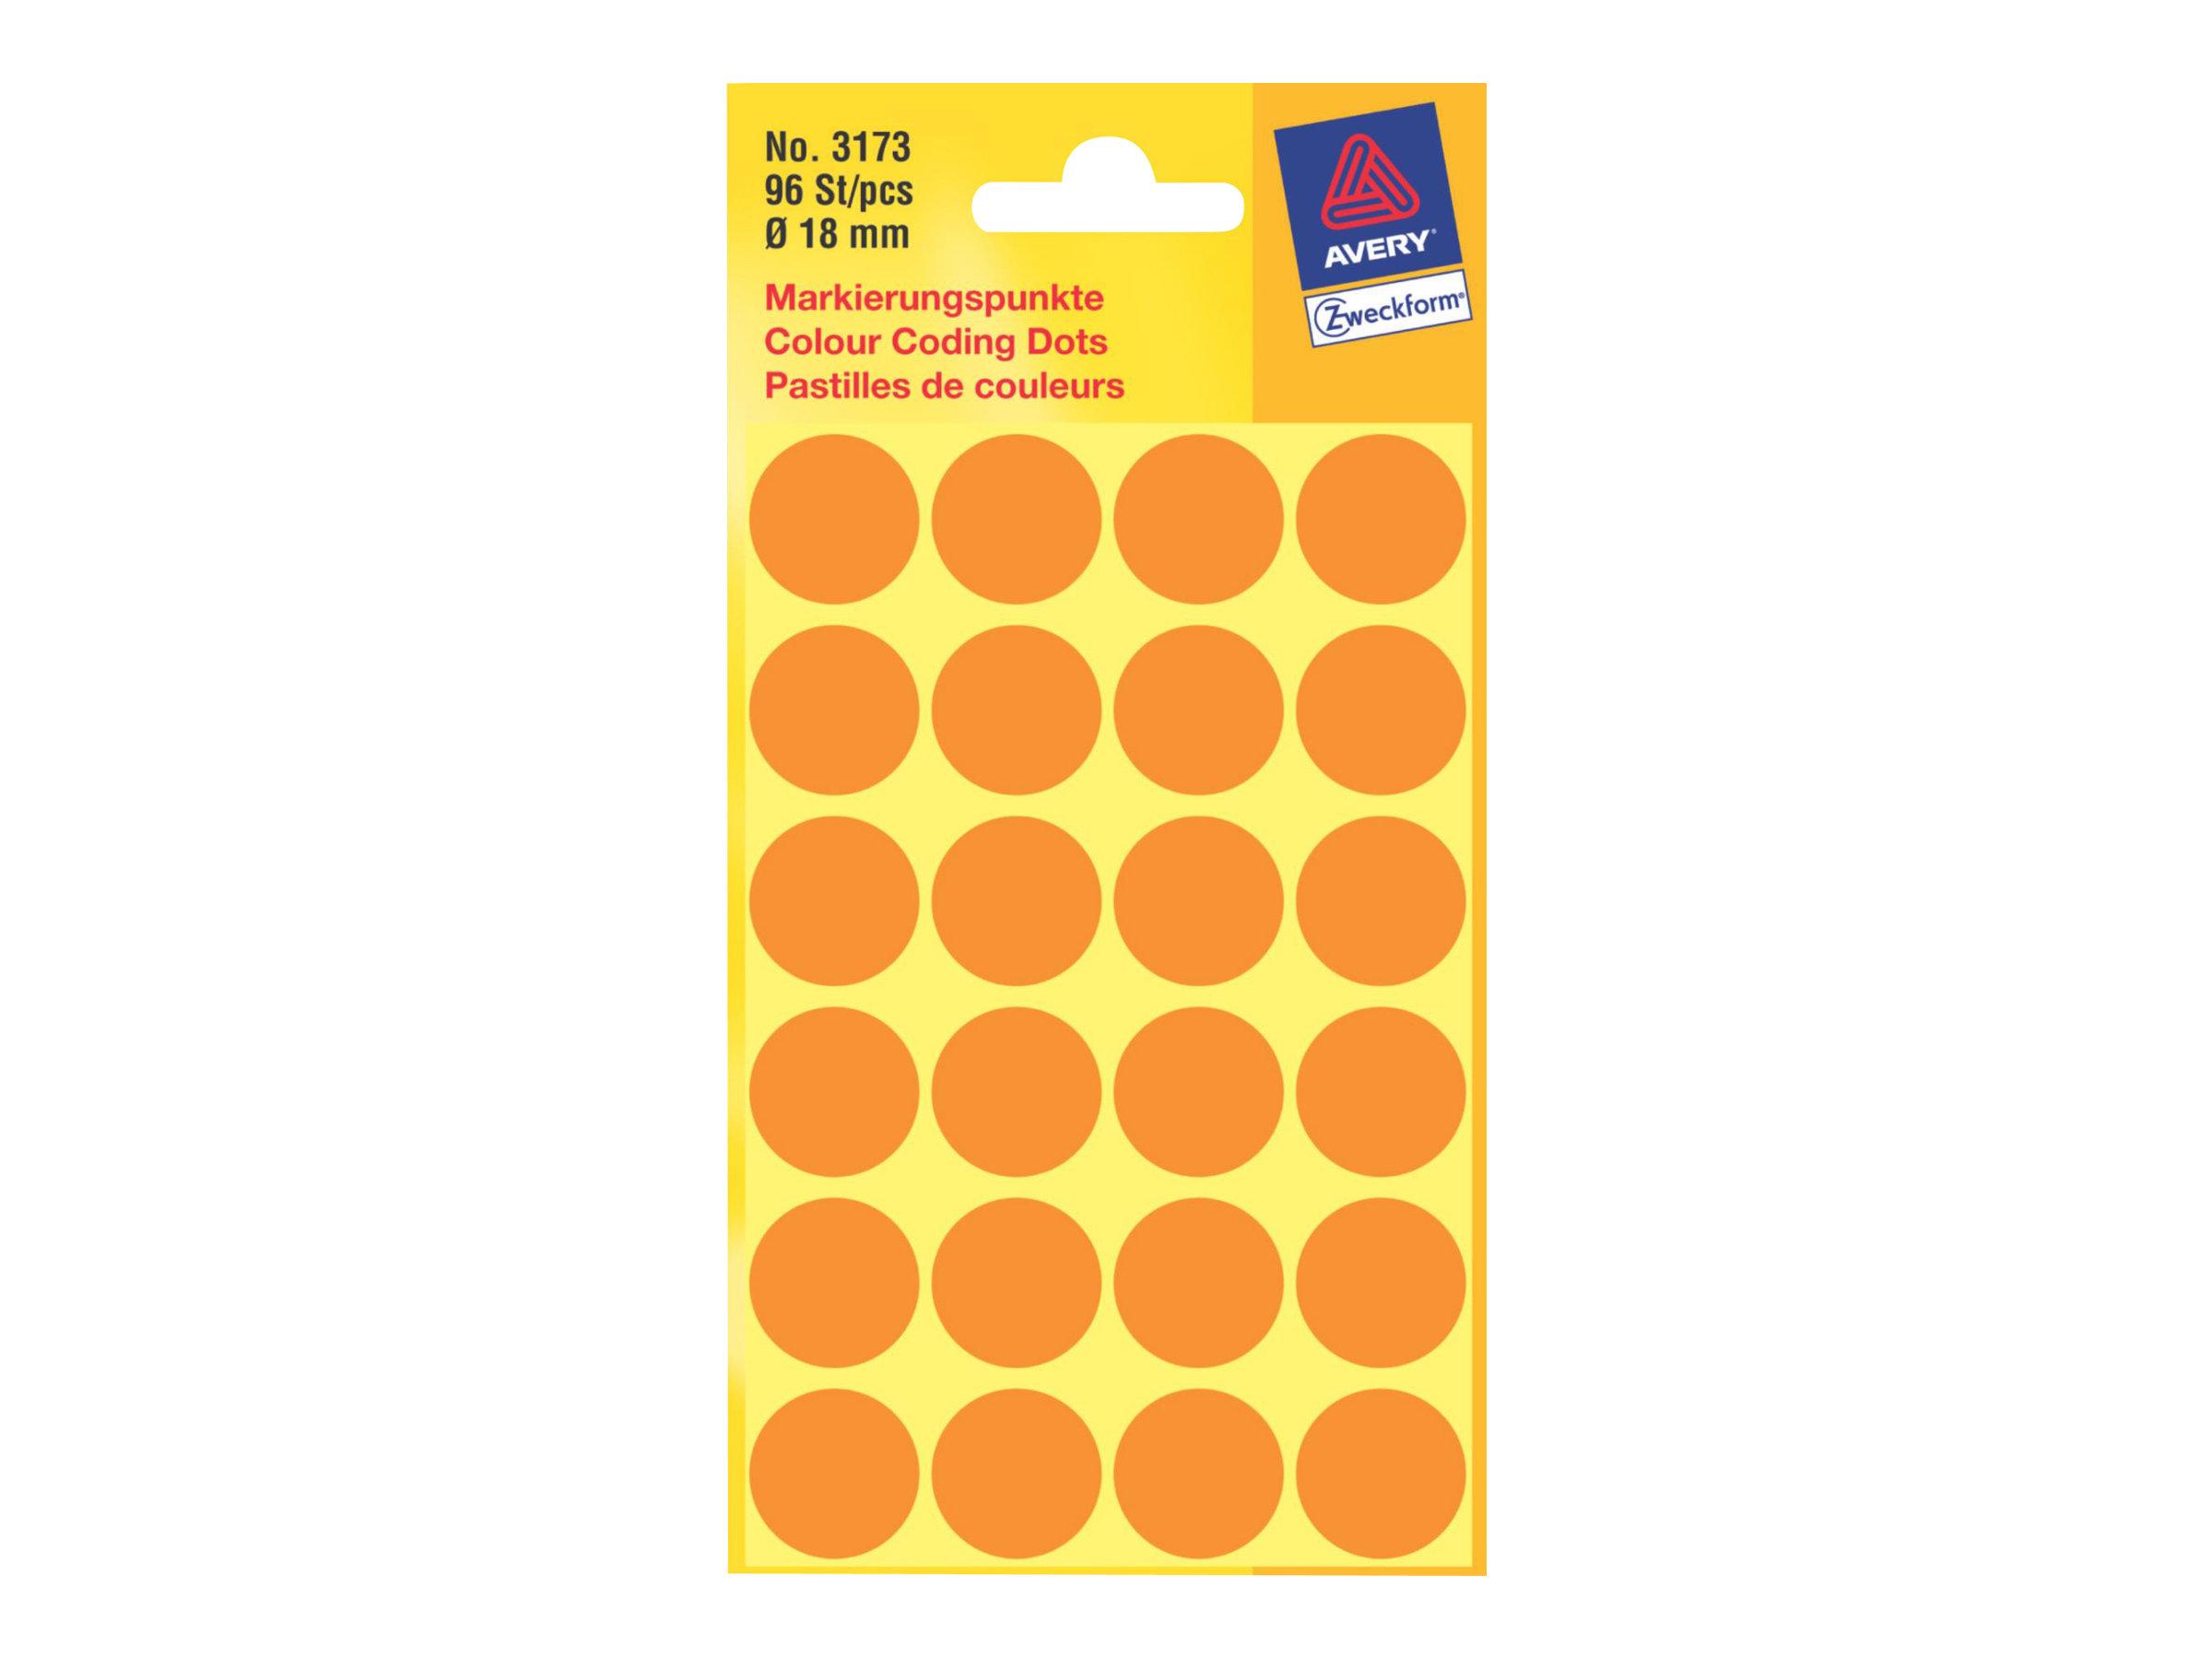 Avery Digital Graphics MPI 3000 - Satiniertes Vinyl - 3,4 mil - weiss - Rolle (137,2 cm x 45,7 m) 1 Rolle(n) Folie / Film